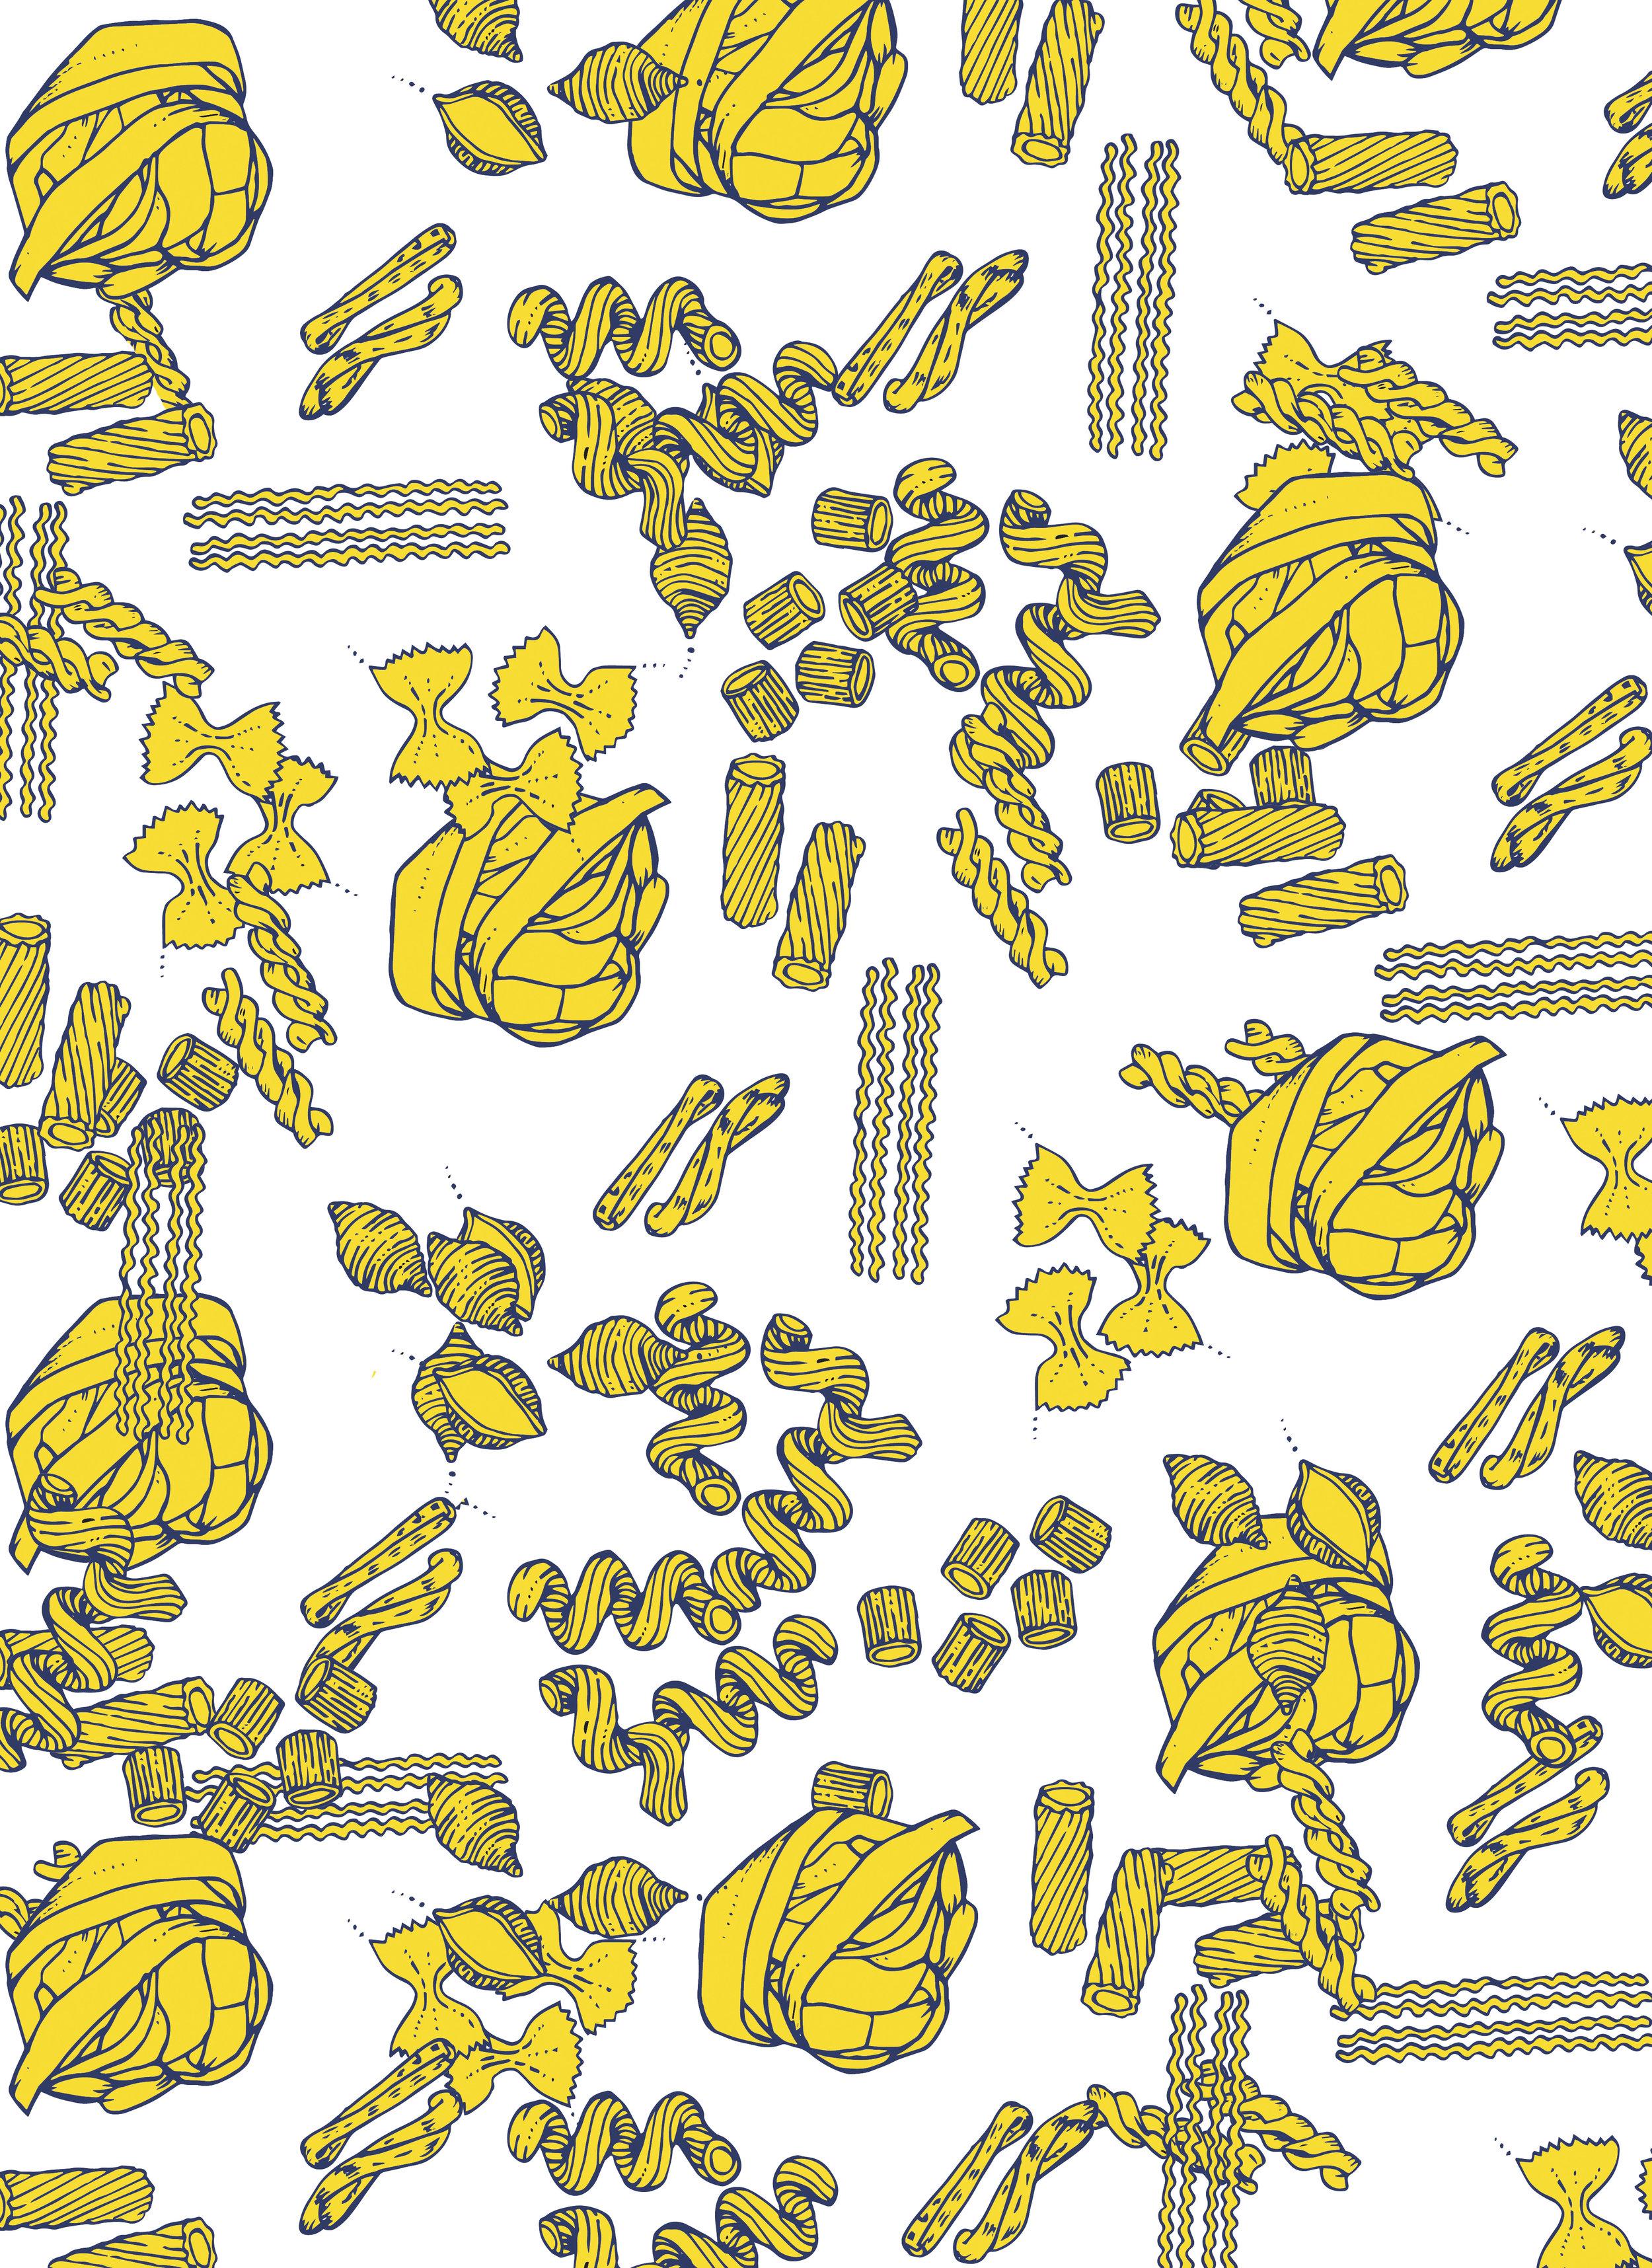 pasta repeat pattern.jpg